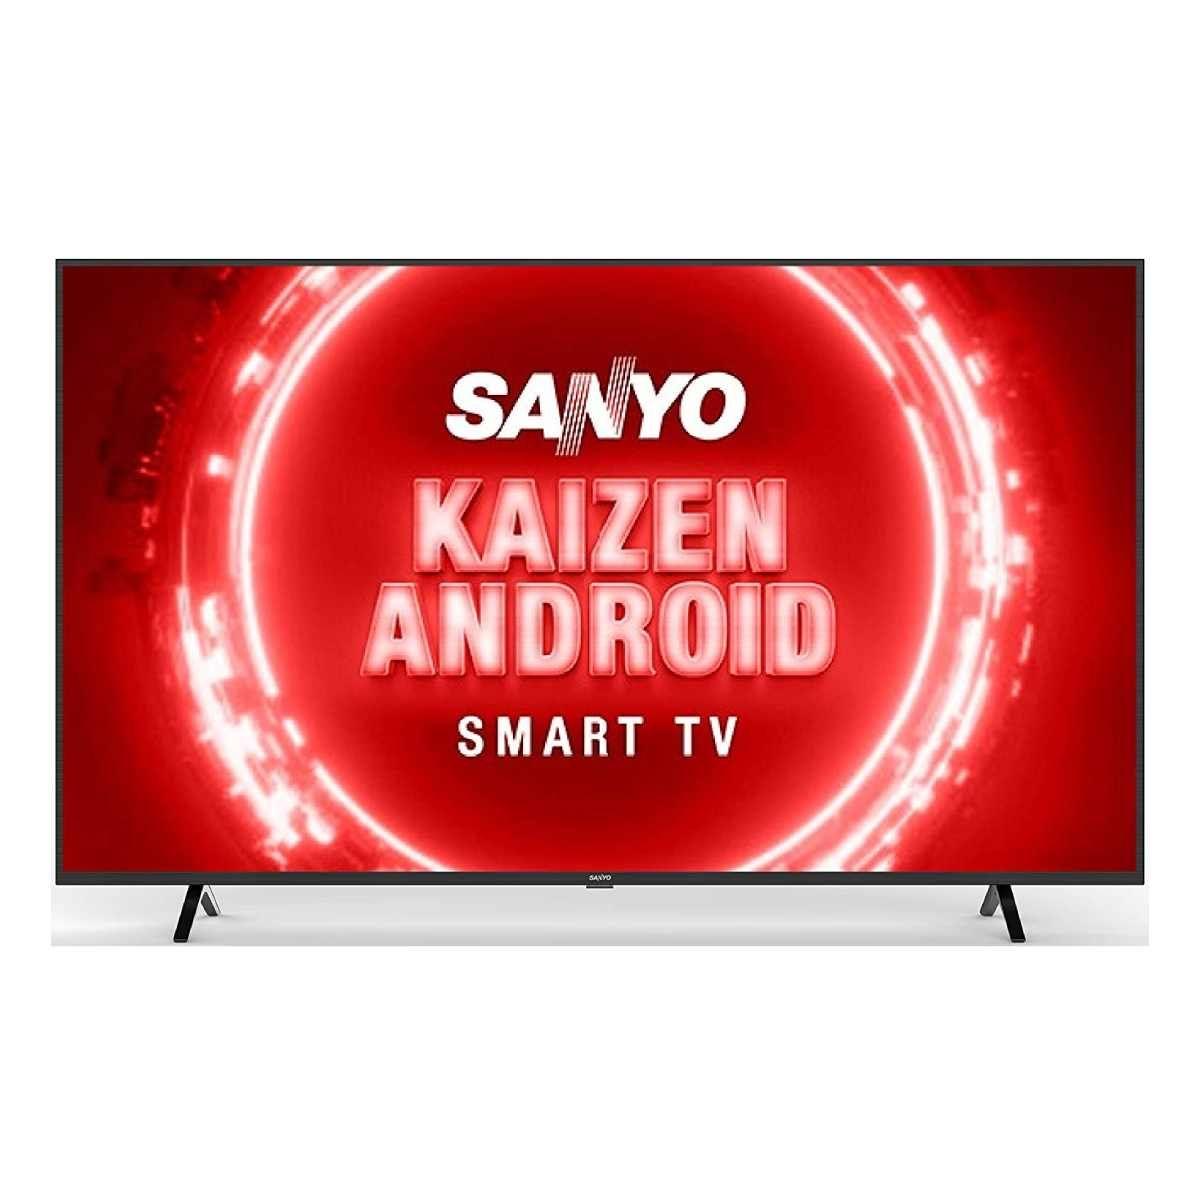 Sanyo 65 inches Kaizen Series 4K Ultra HD LED TV (XT-65UHD4S)